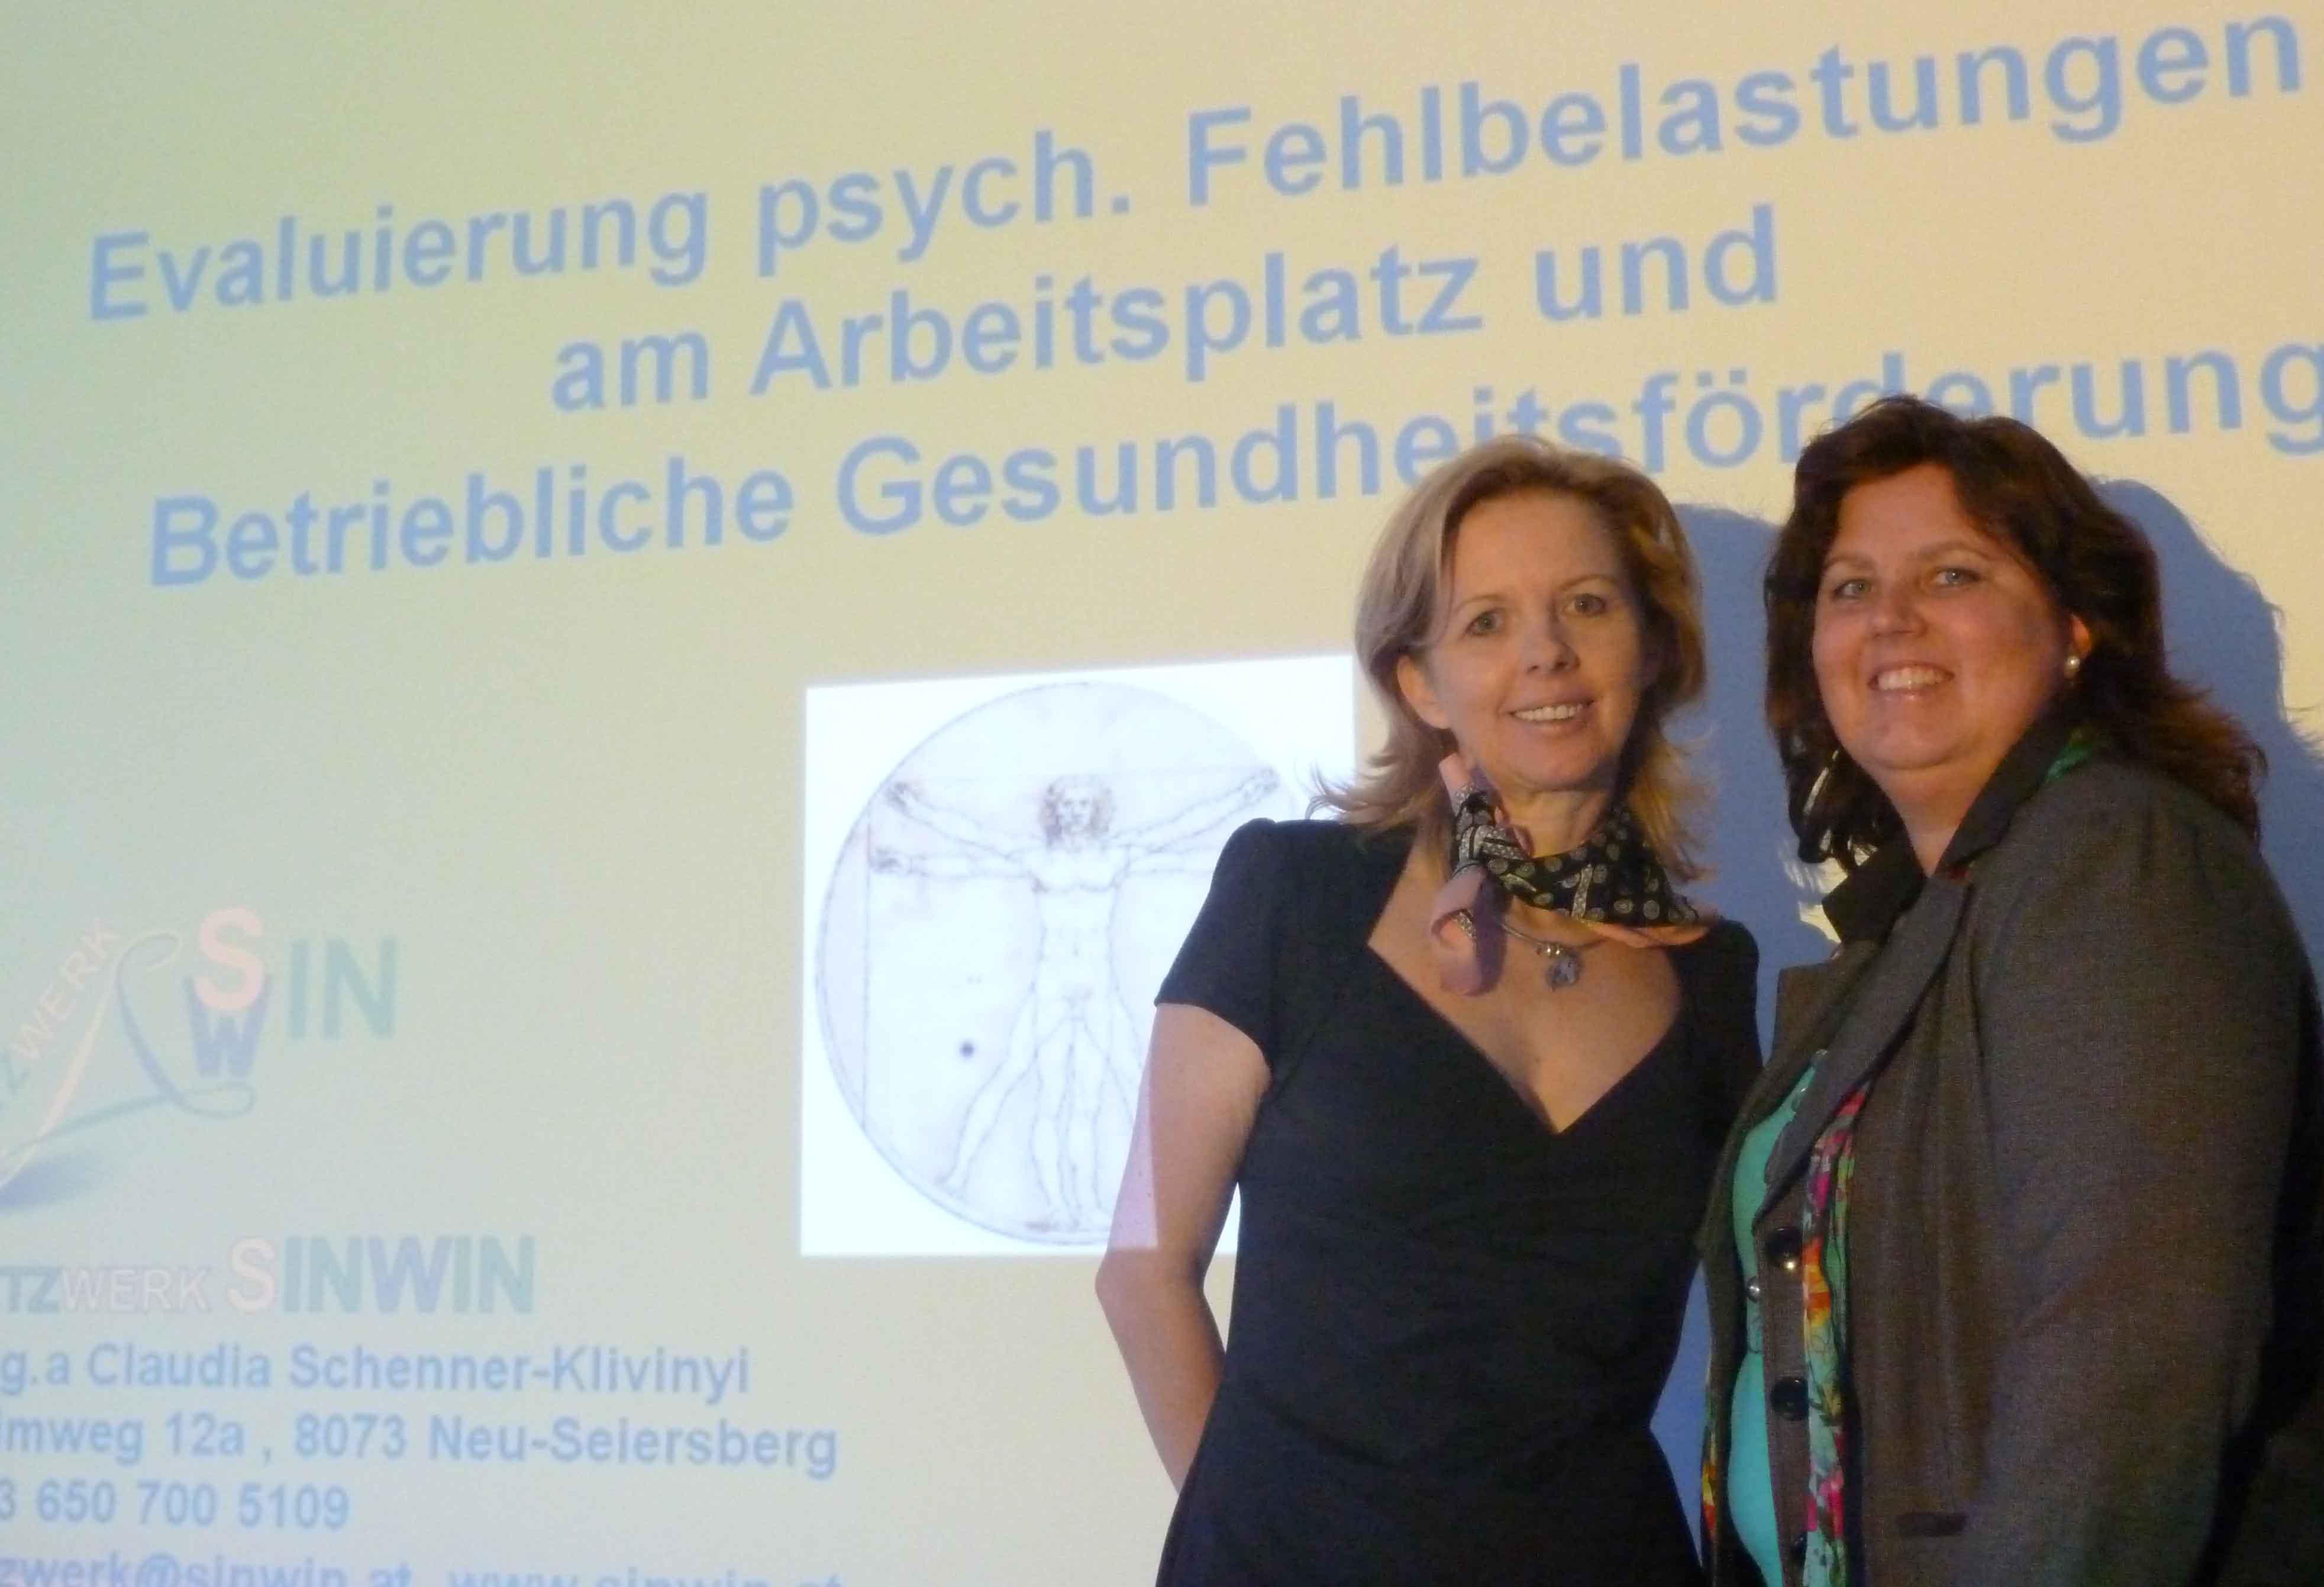 Vortrag-Evaluierung-Psychischer-Belastung-Ulrike-Sabathy